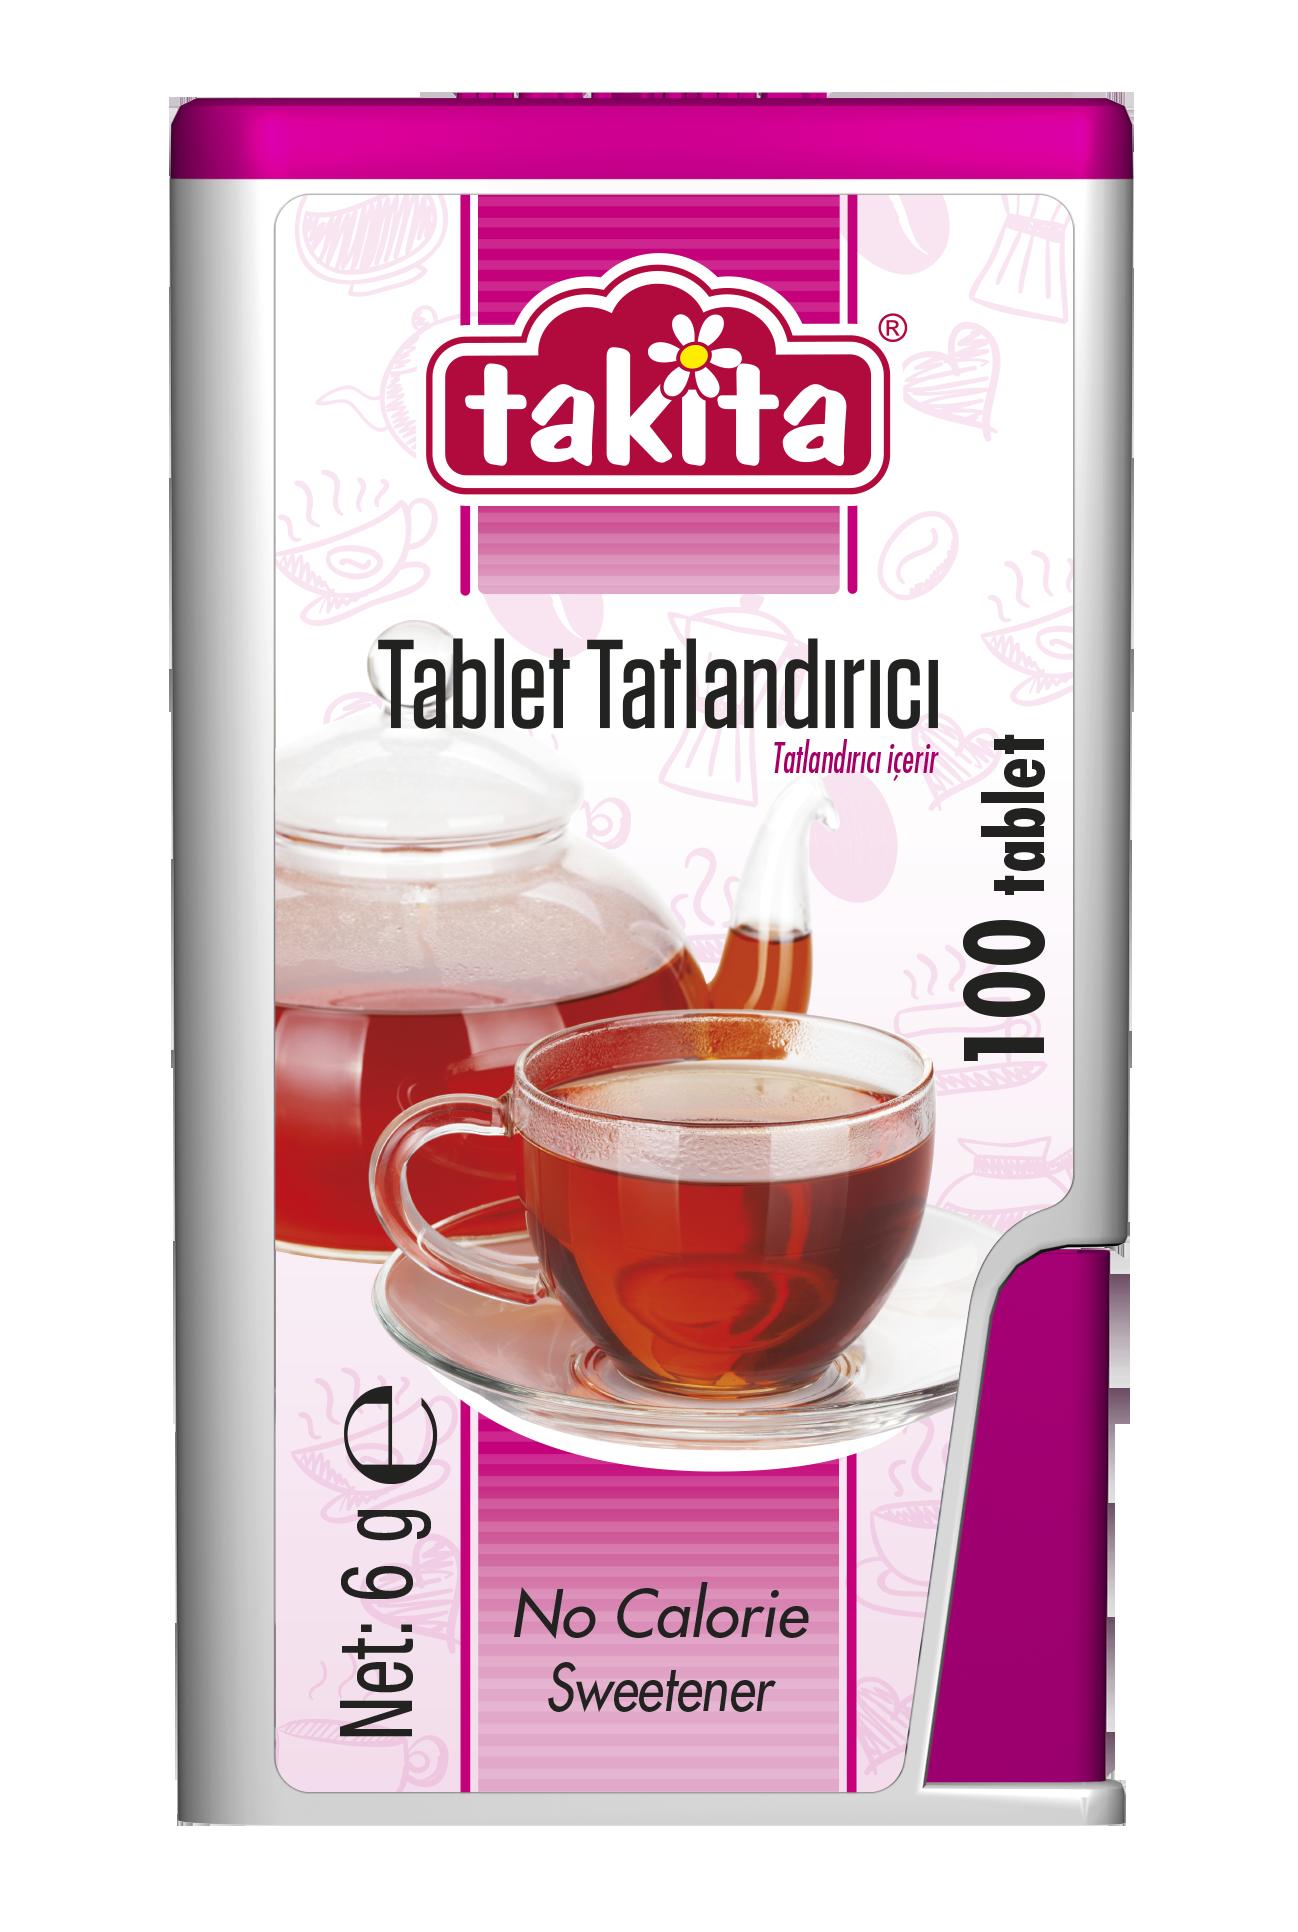 Takita Tablet Sweetener with Saccharine